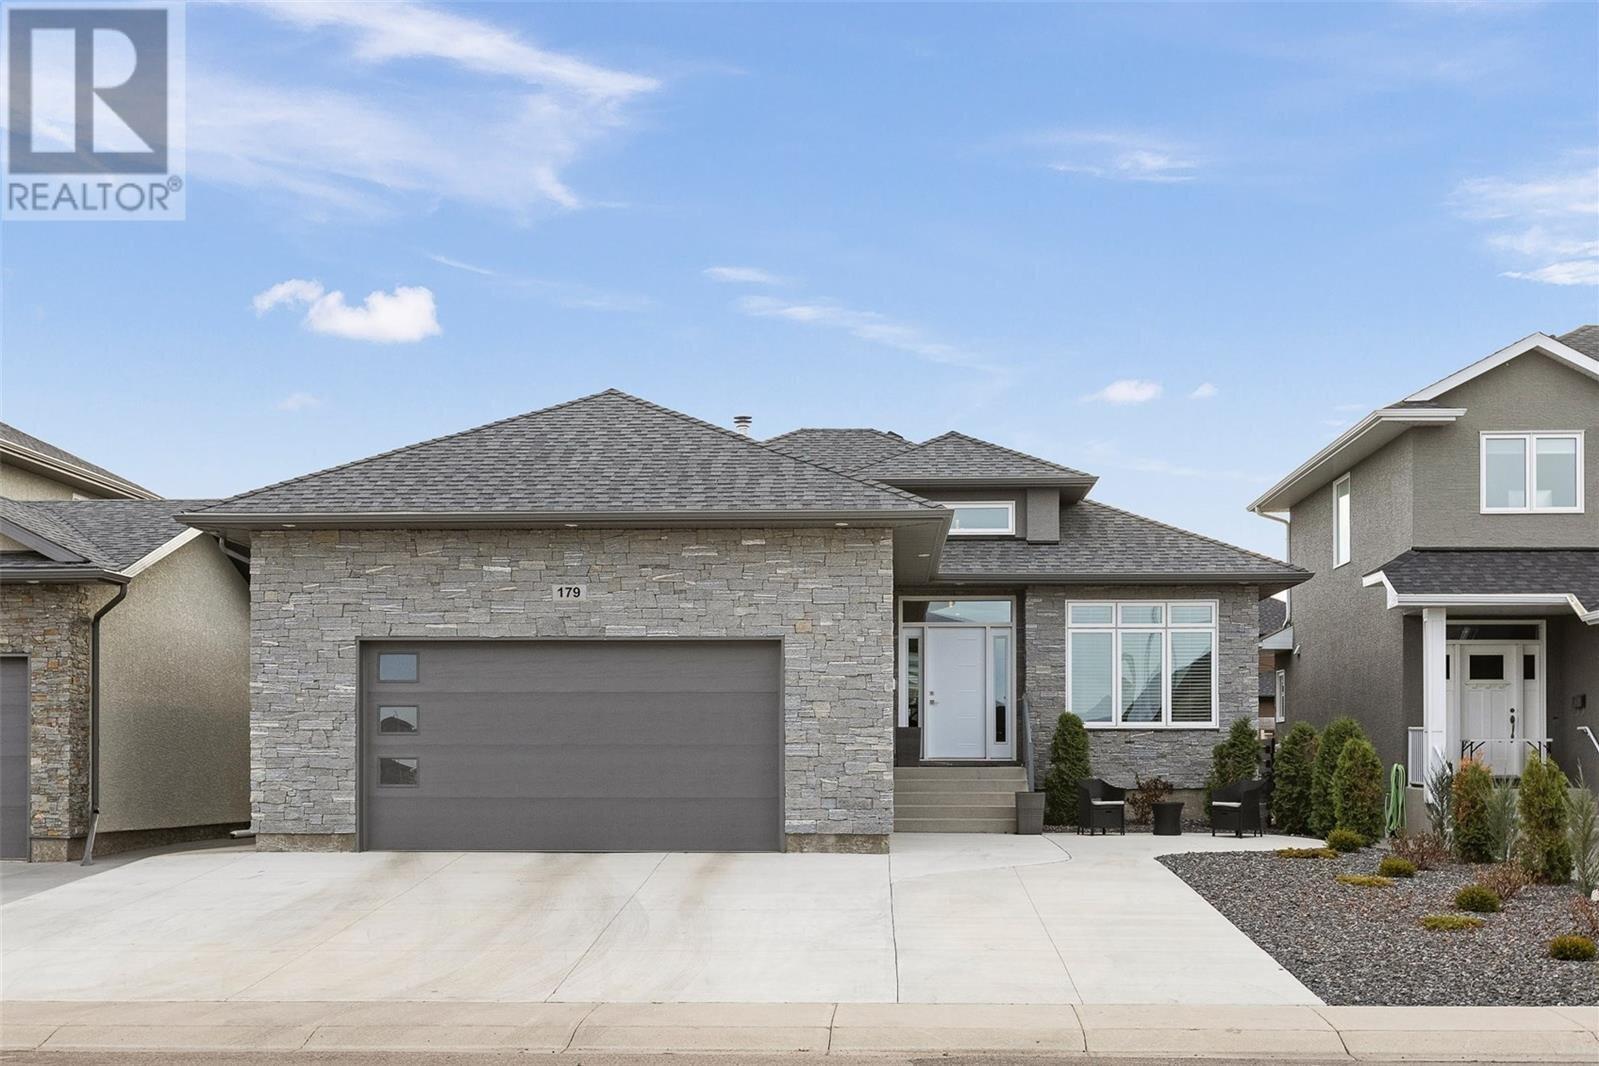 House for sale at 179 Johns Rd Saskatoon Saskatchewan - MLS: SK831832